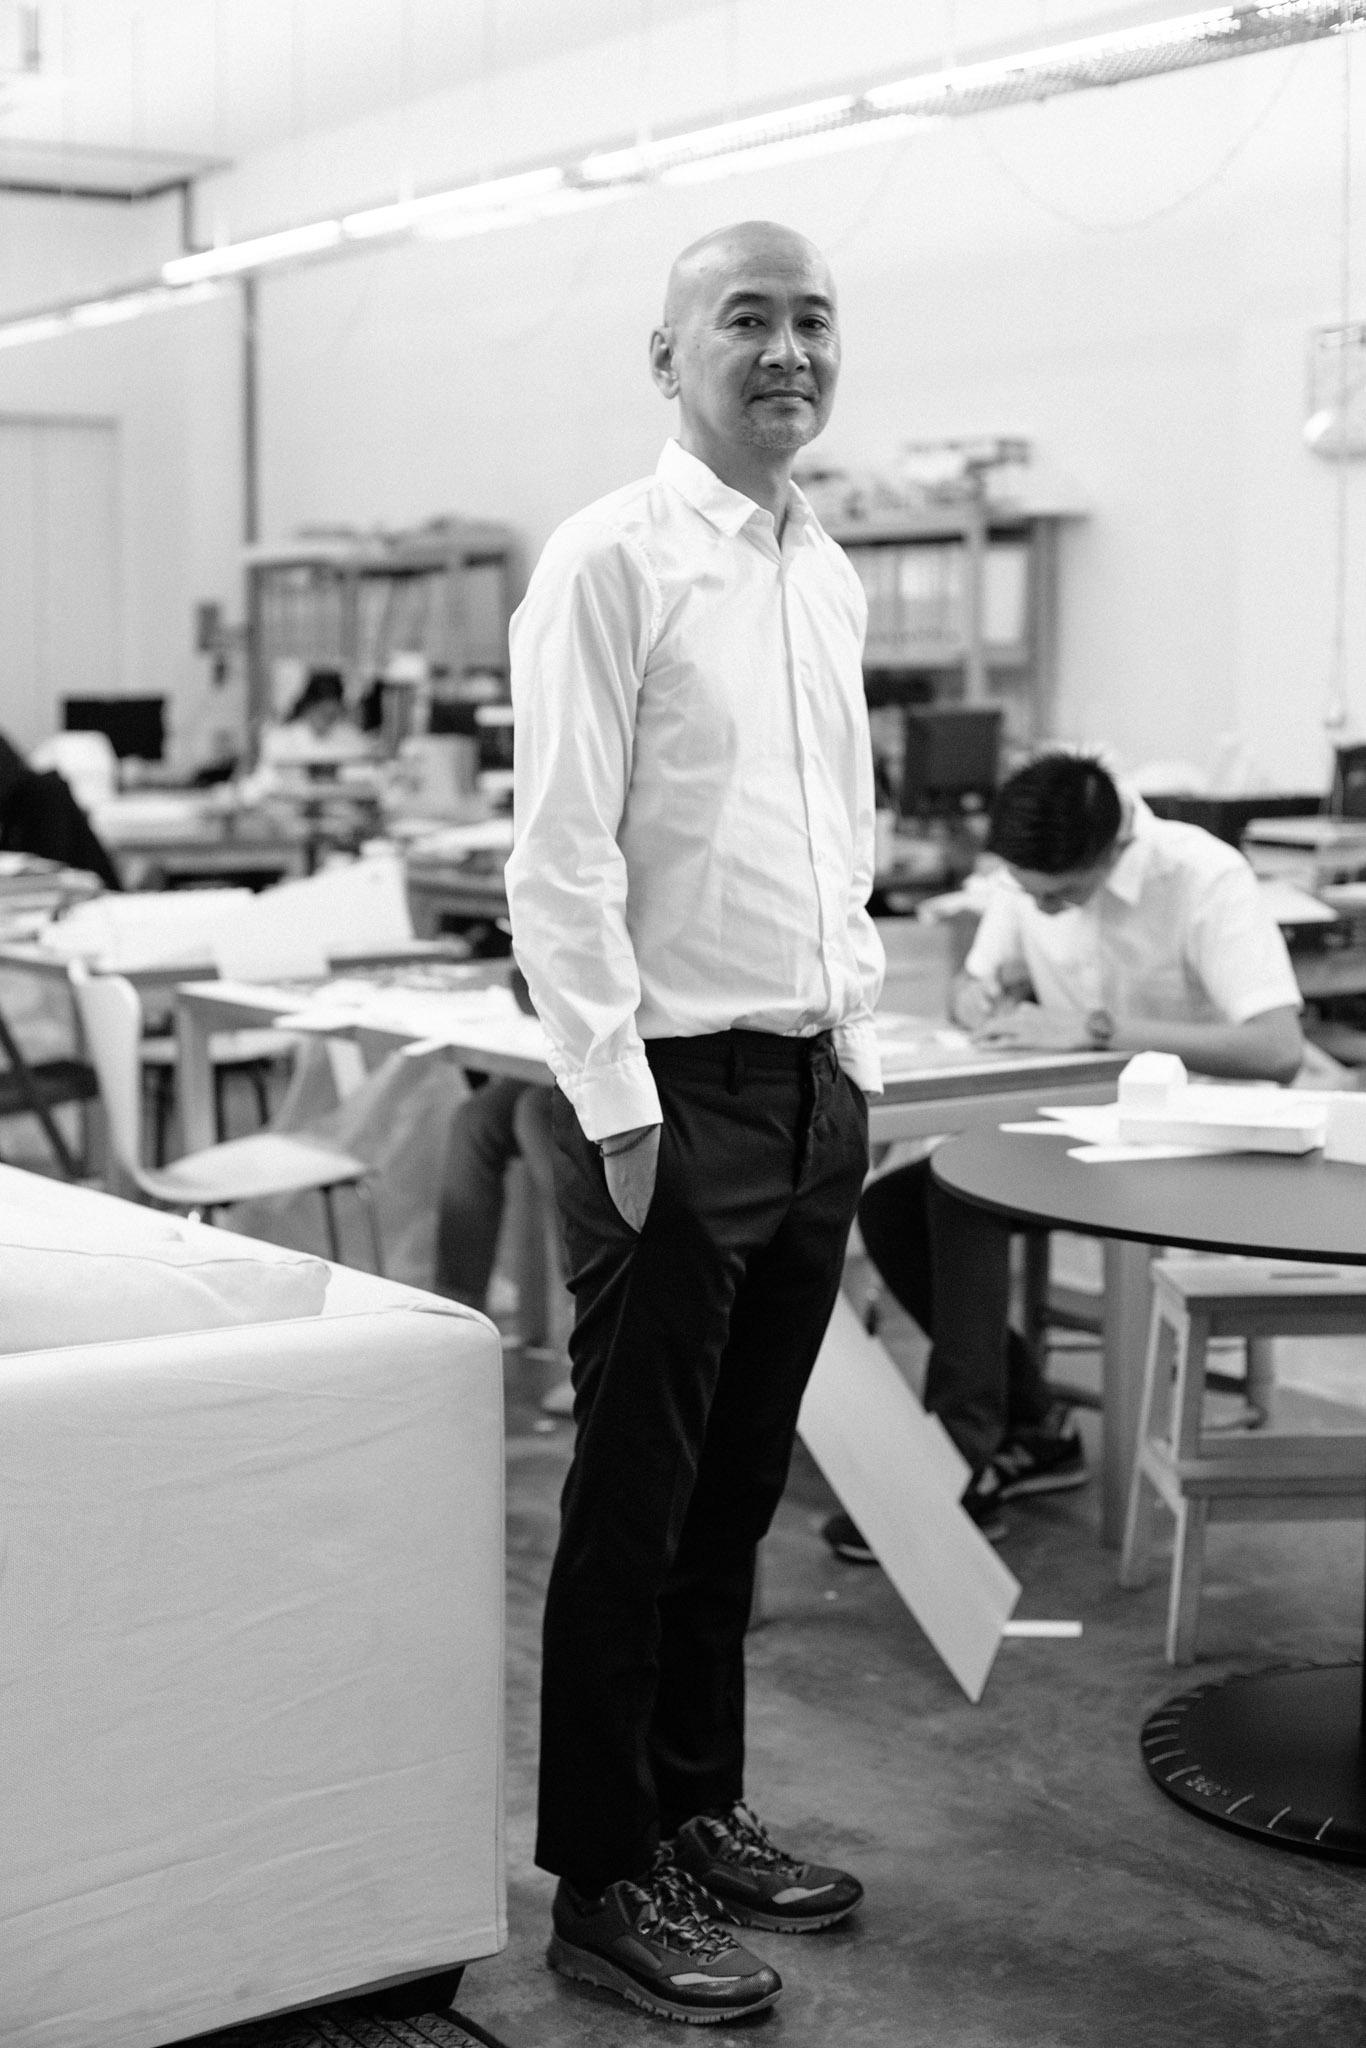 singapore-commercial-editorial-photographer-architecture-president-design-award-singapore-architect-magazine-zakaria-zainal-18.jpg